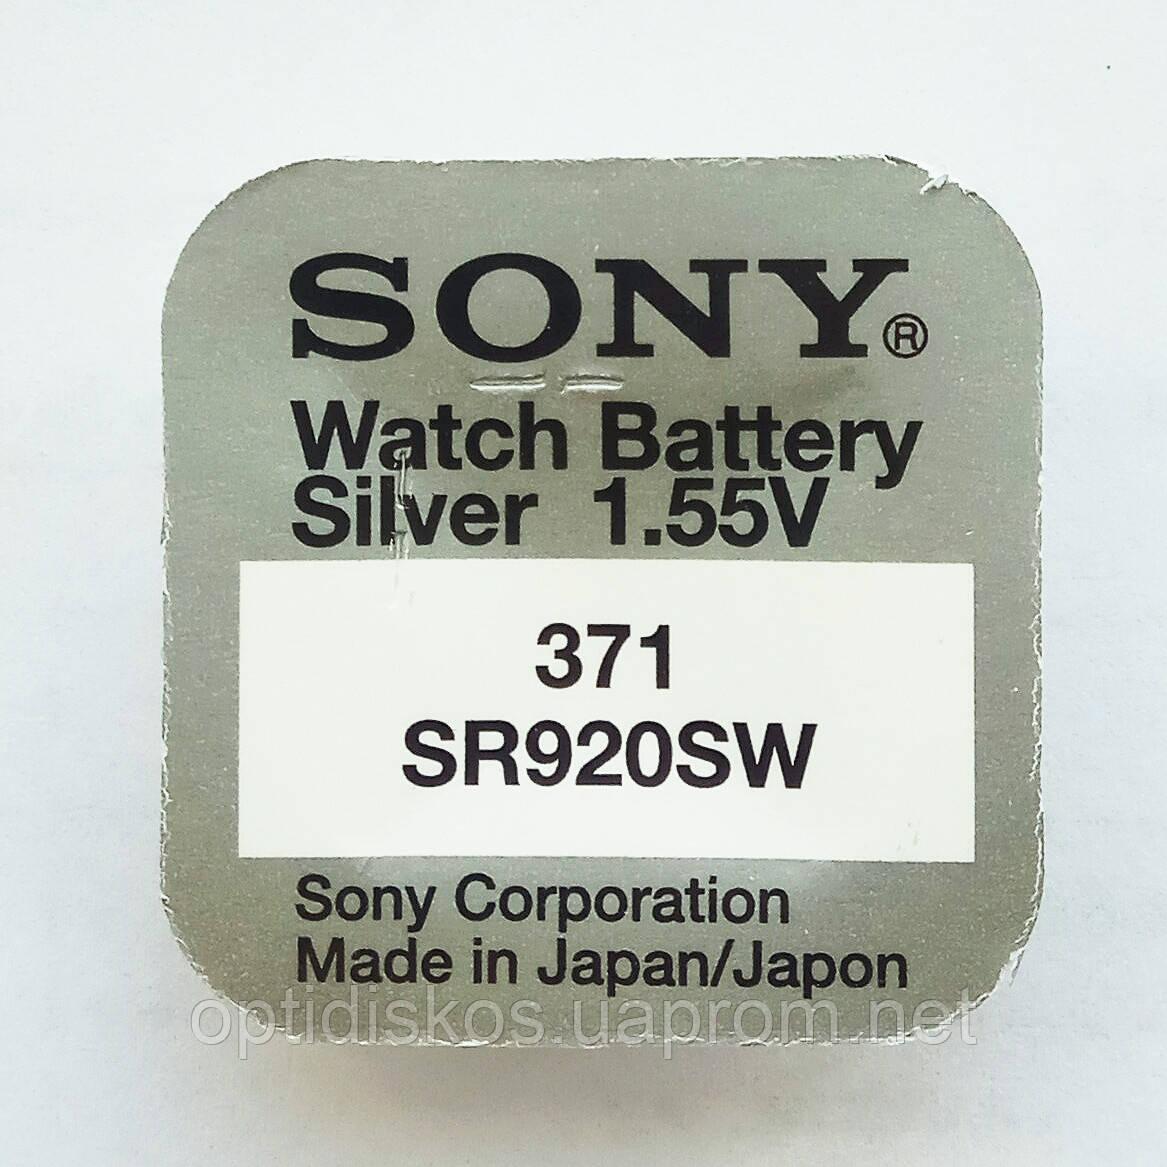 Часовая батарейка Sony SR920 (370/371)